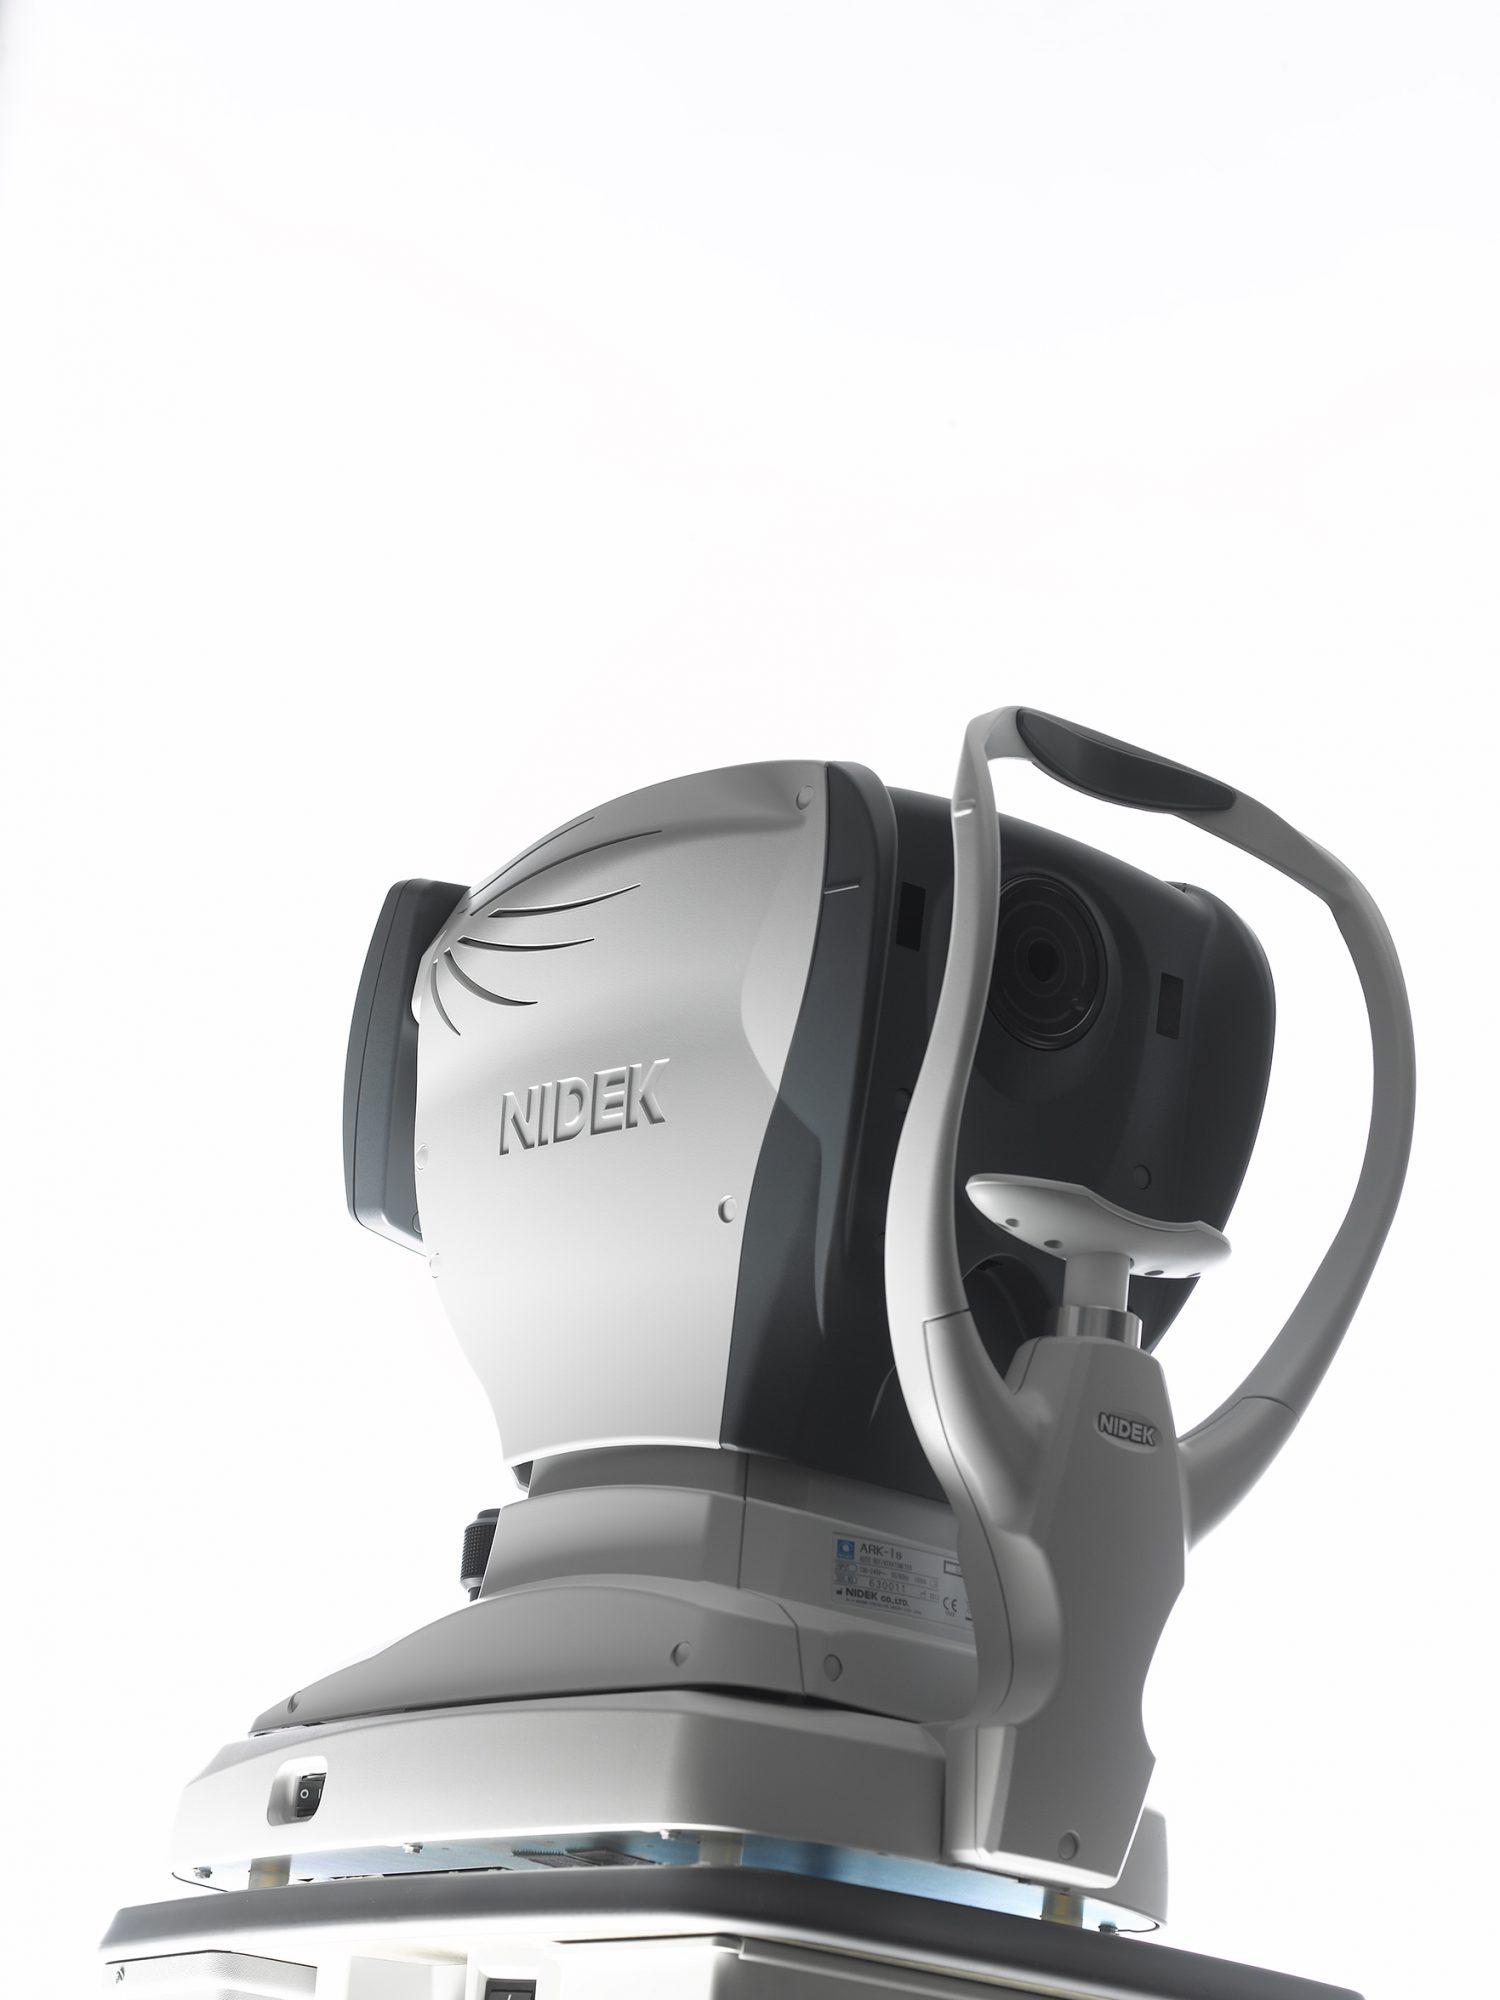 https://www.lameris-group.nl/wp-content/uploads/2020/03/Nidek-Auto-RefKeratometer-AR-K-1s1a1-4.jpg